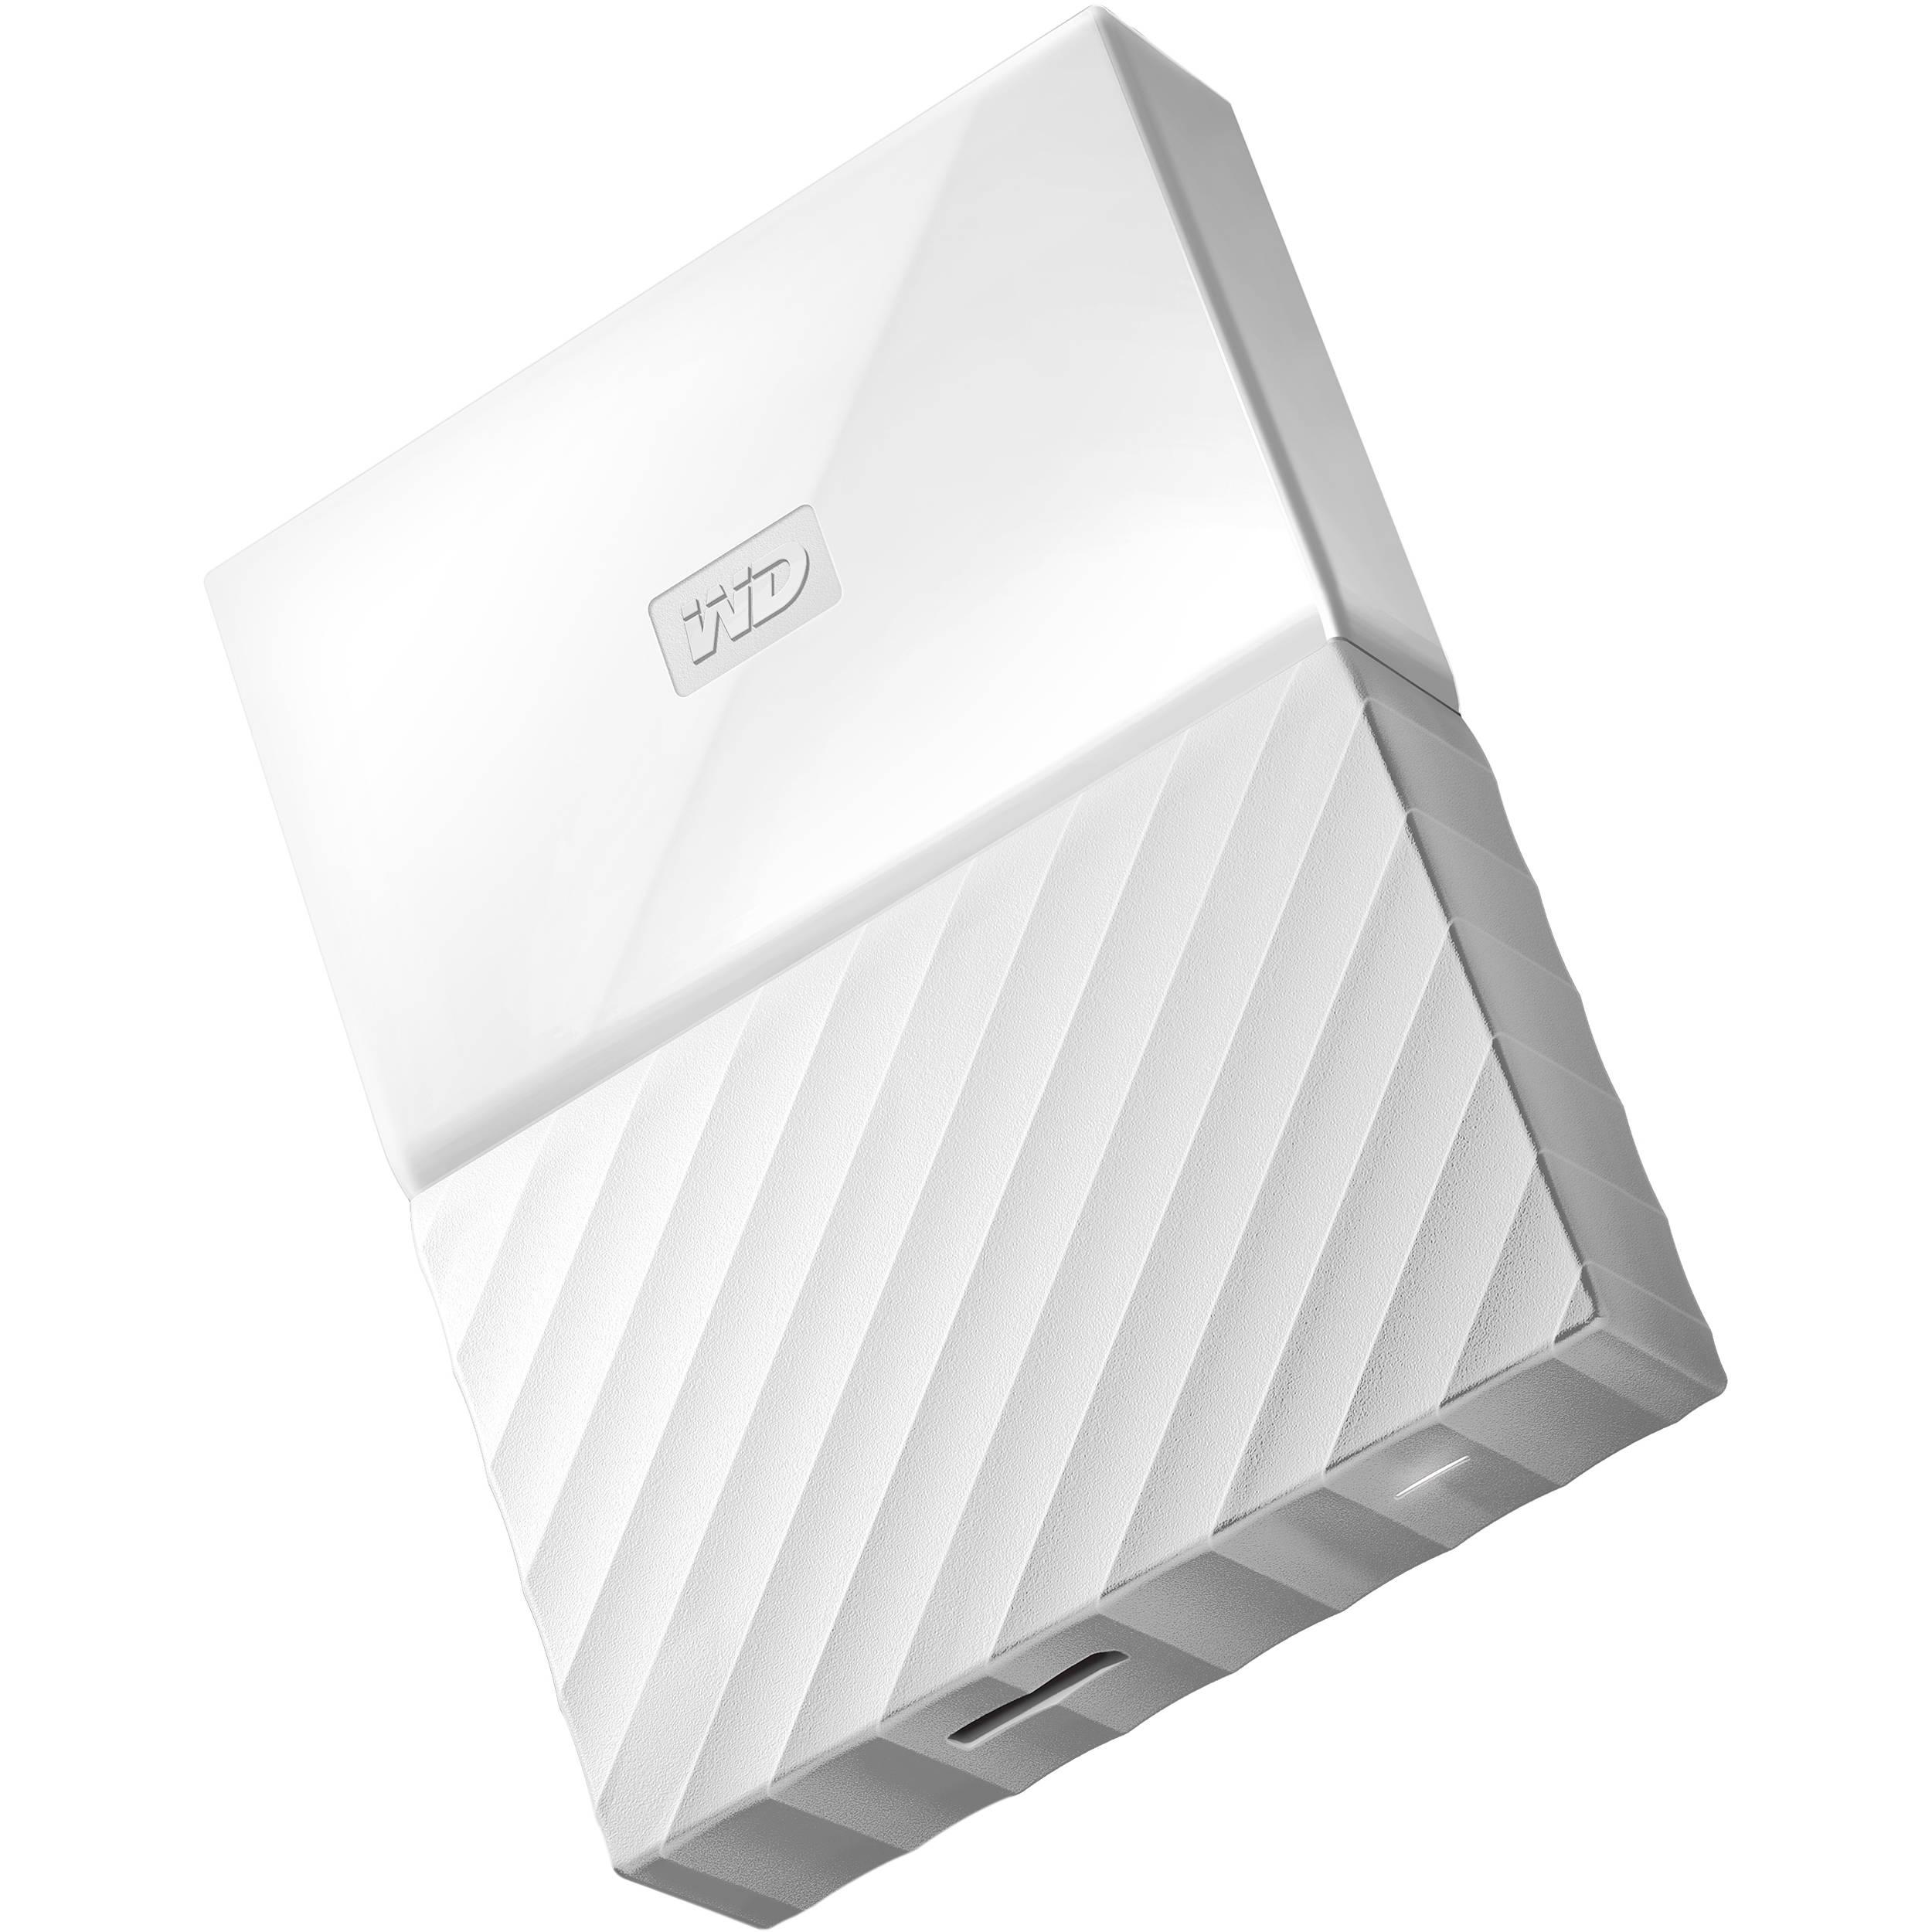 WD 4TB My Passport USB 3 0 Secure Portable Hard Drive (White)